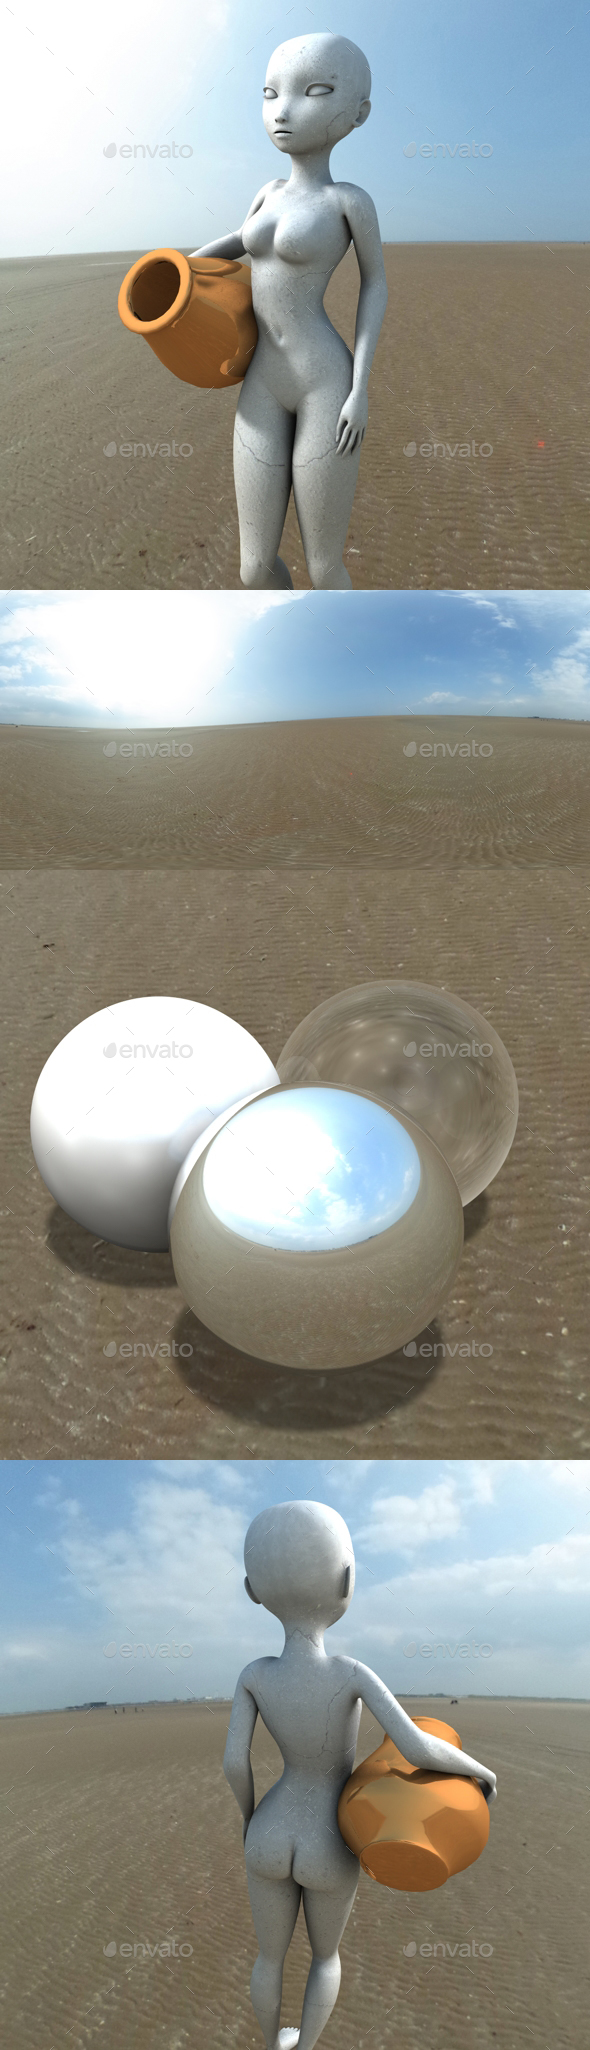 Bright Sunny Sky HDRI - 3DOcean Item for Sale